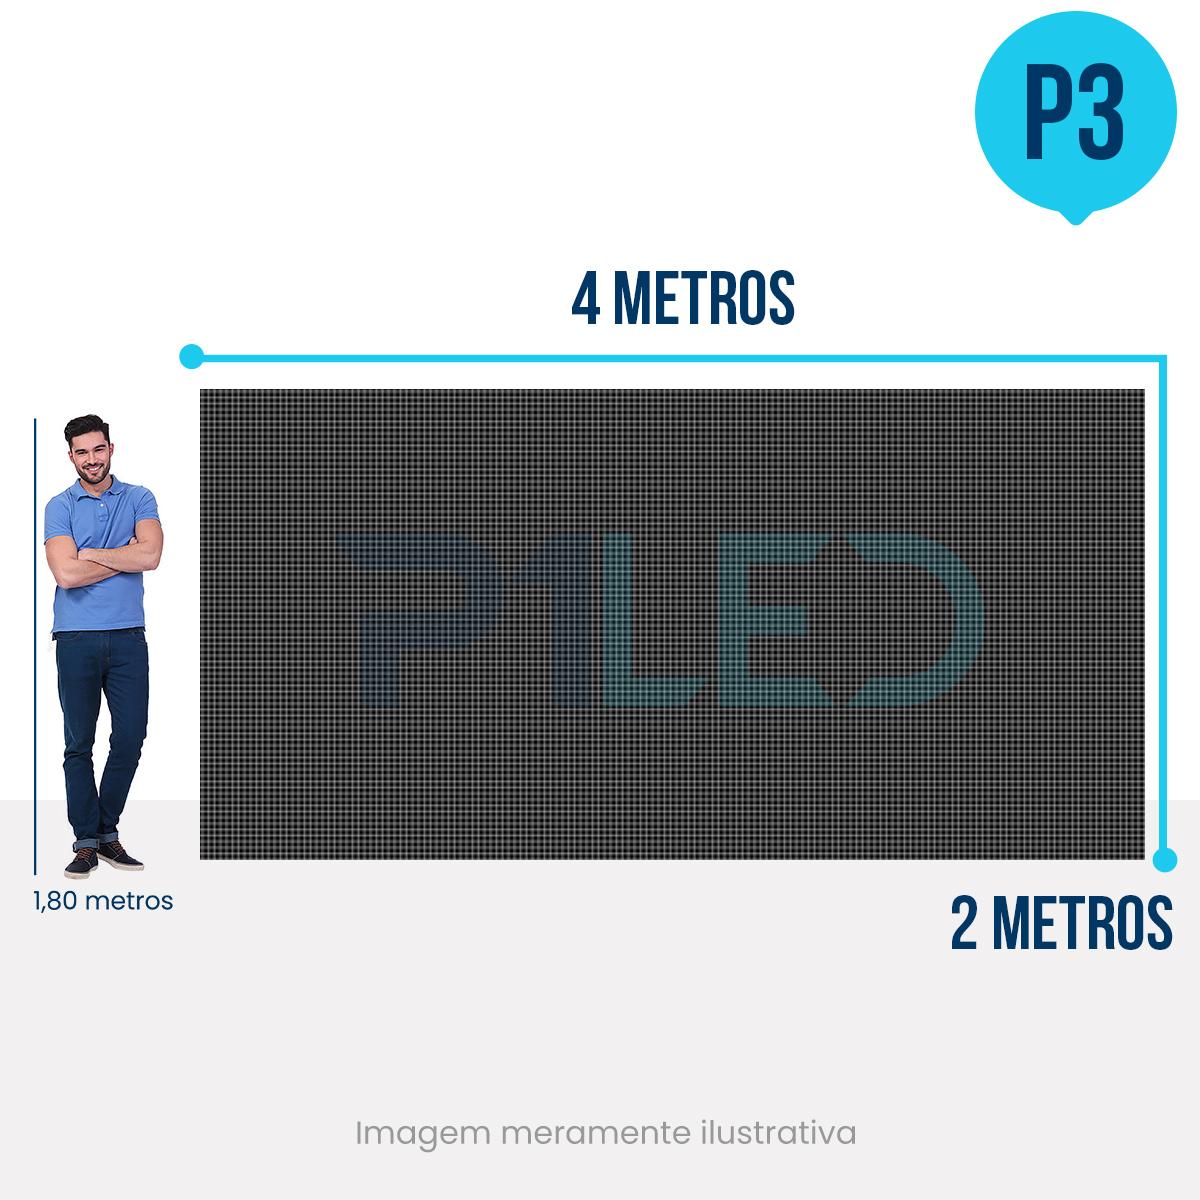 Painel de LED para Shopping 4x2 - Telão P3 Indoor  - Painel e Telão de LED - O Melhor Preço em Painel de LED | P1LED